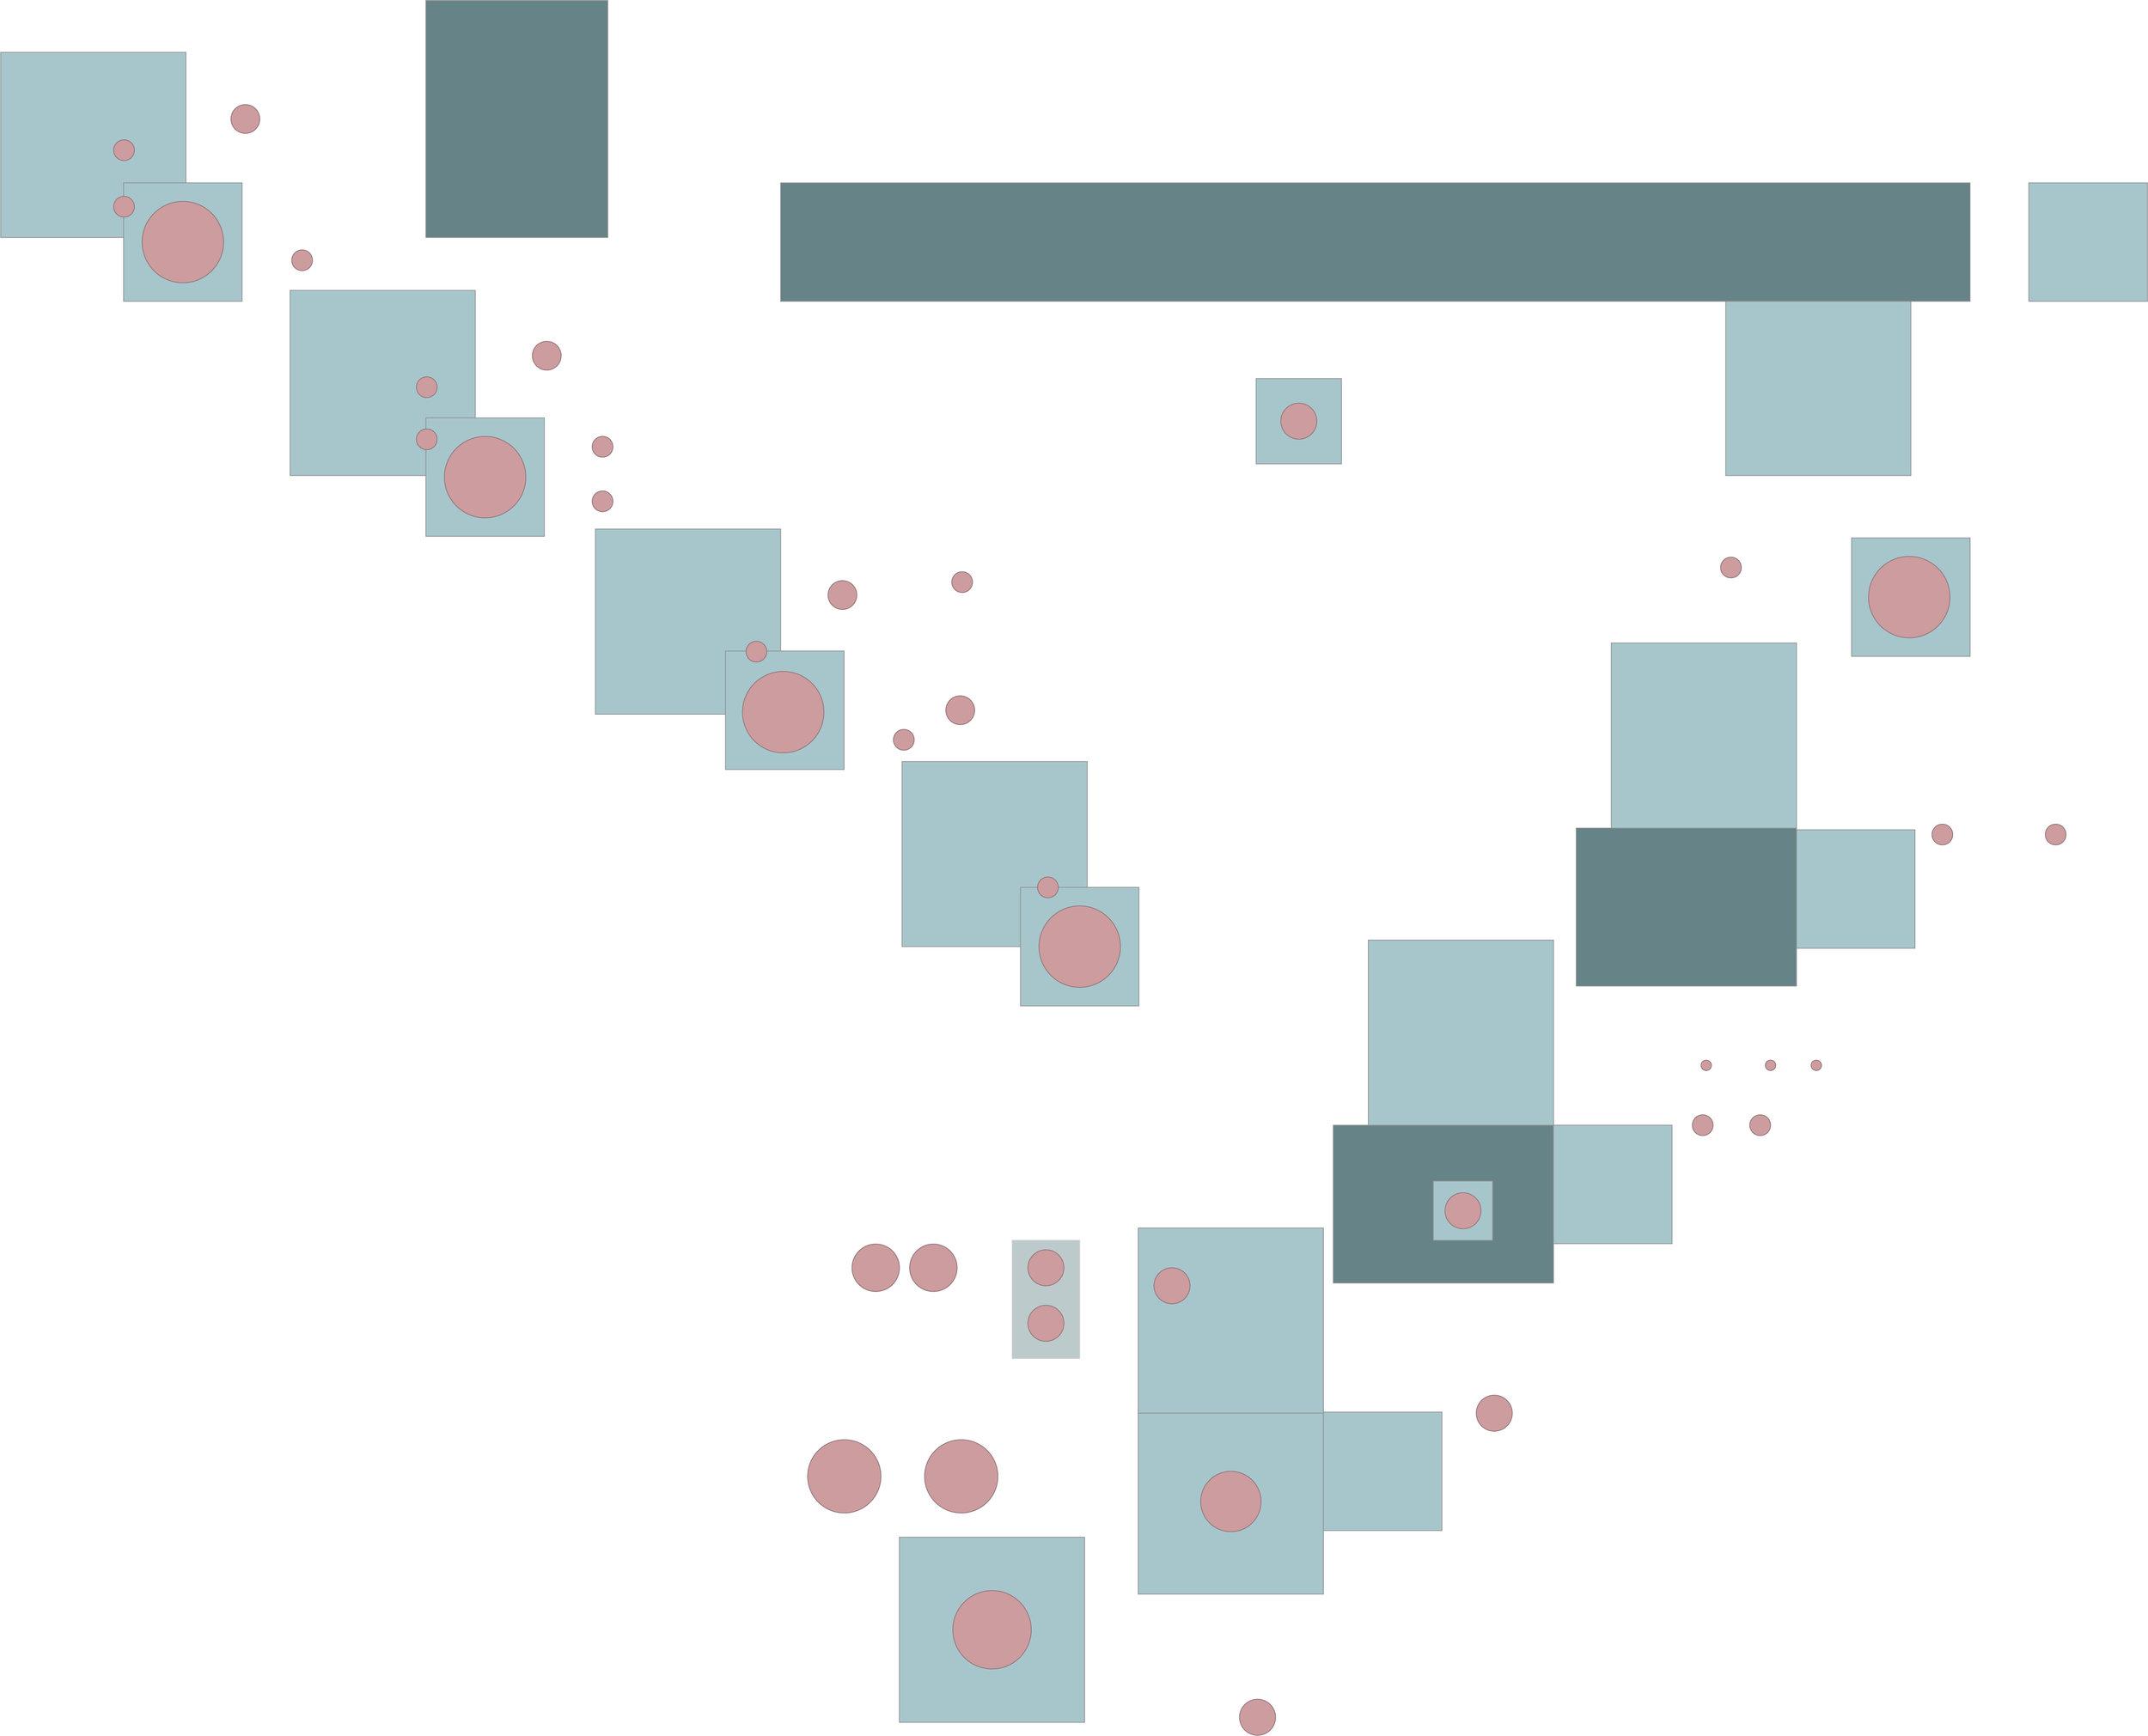 analysis of orphanage's primary geometric elements